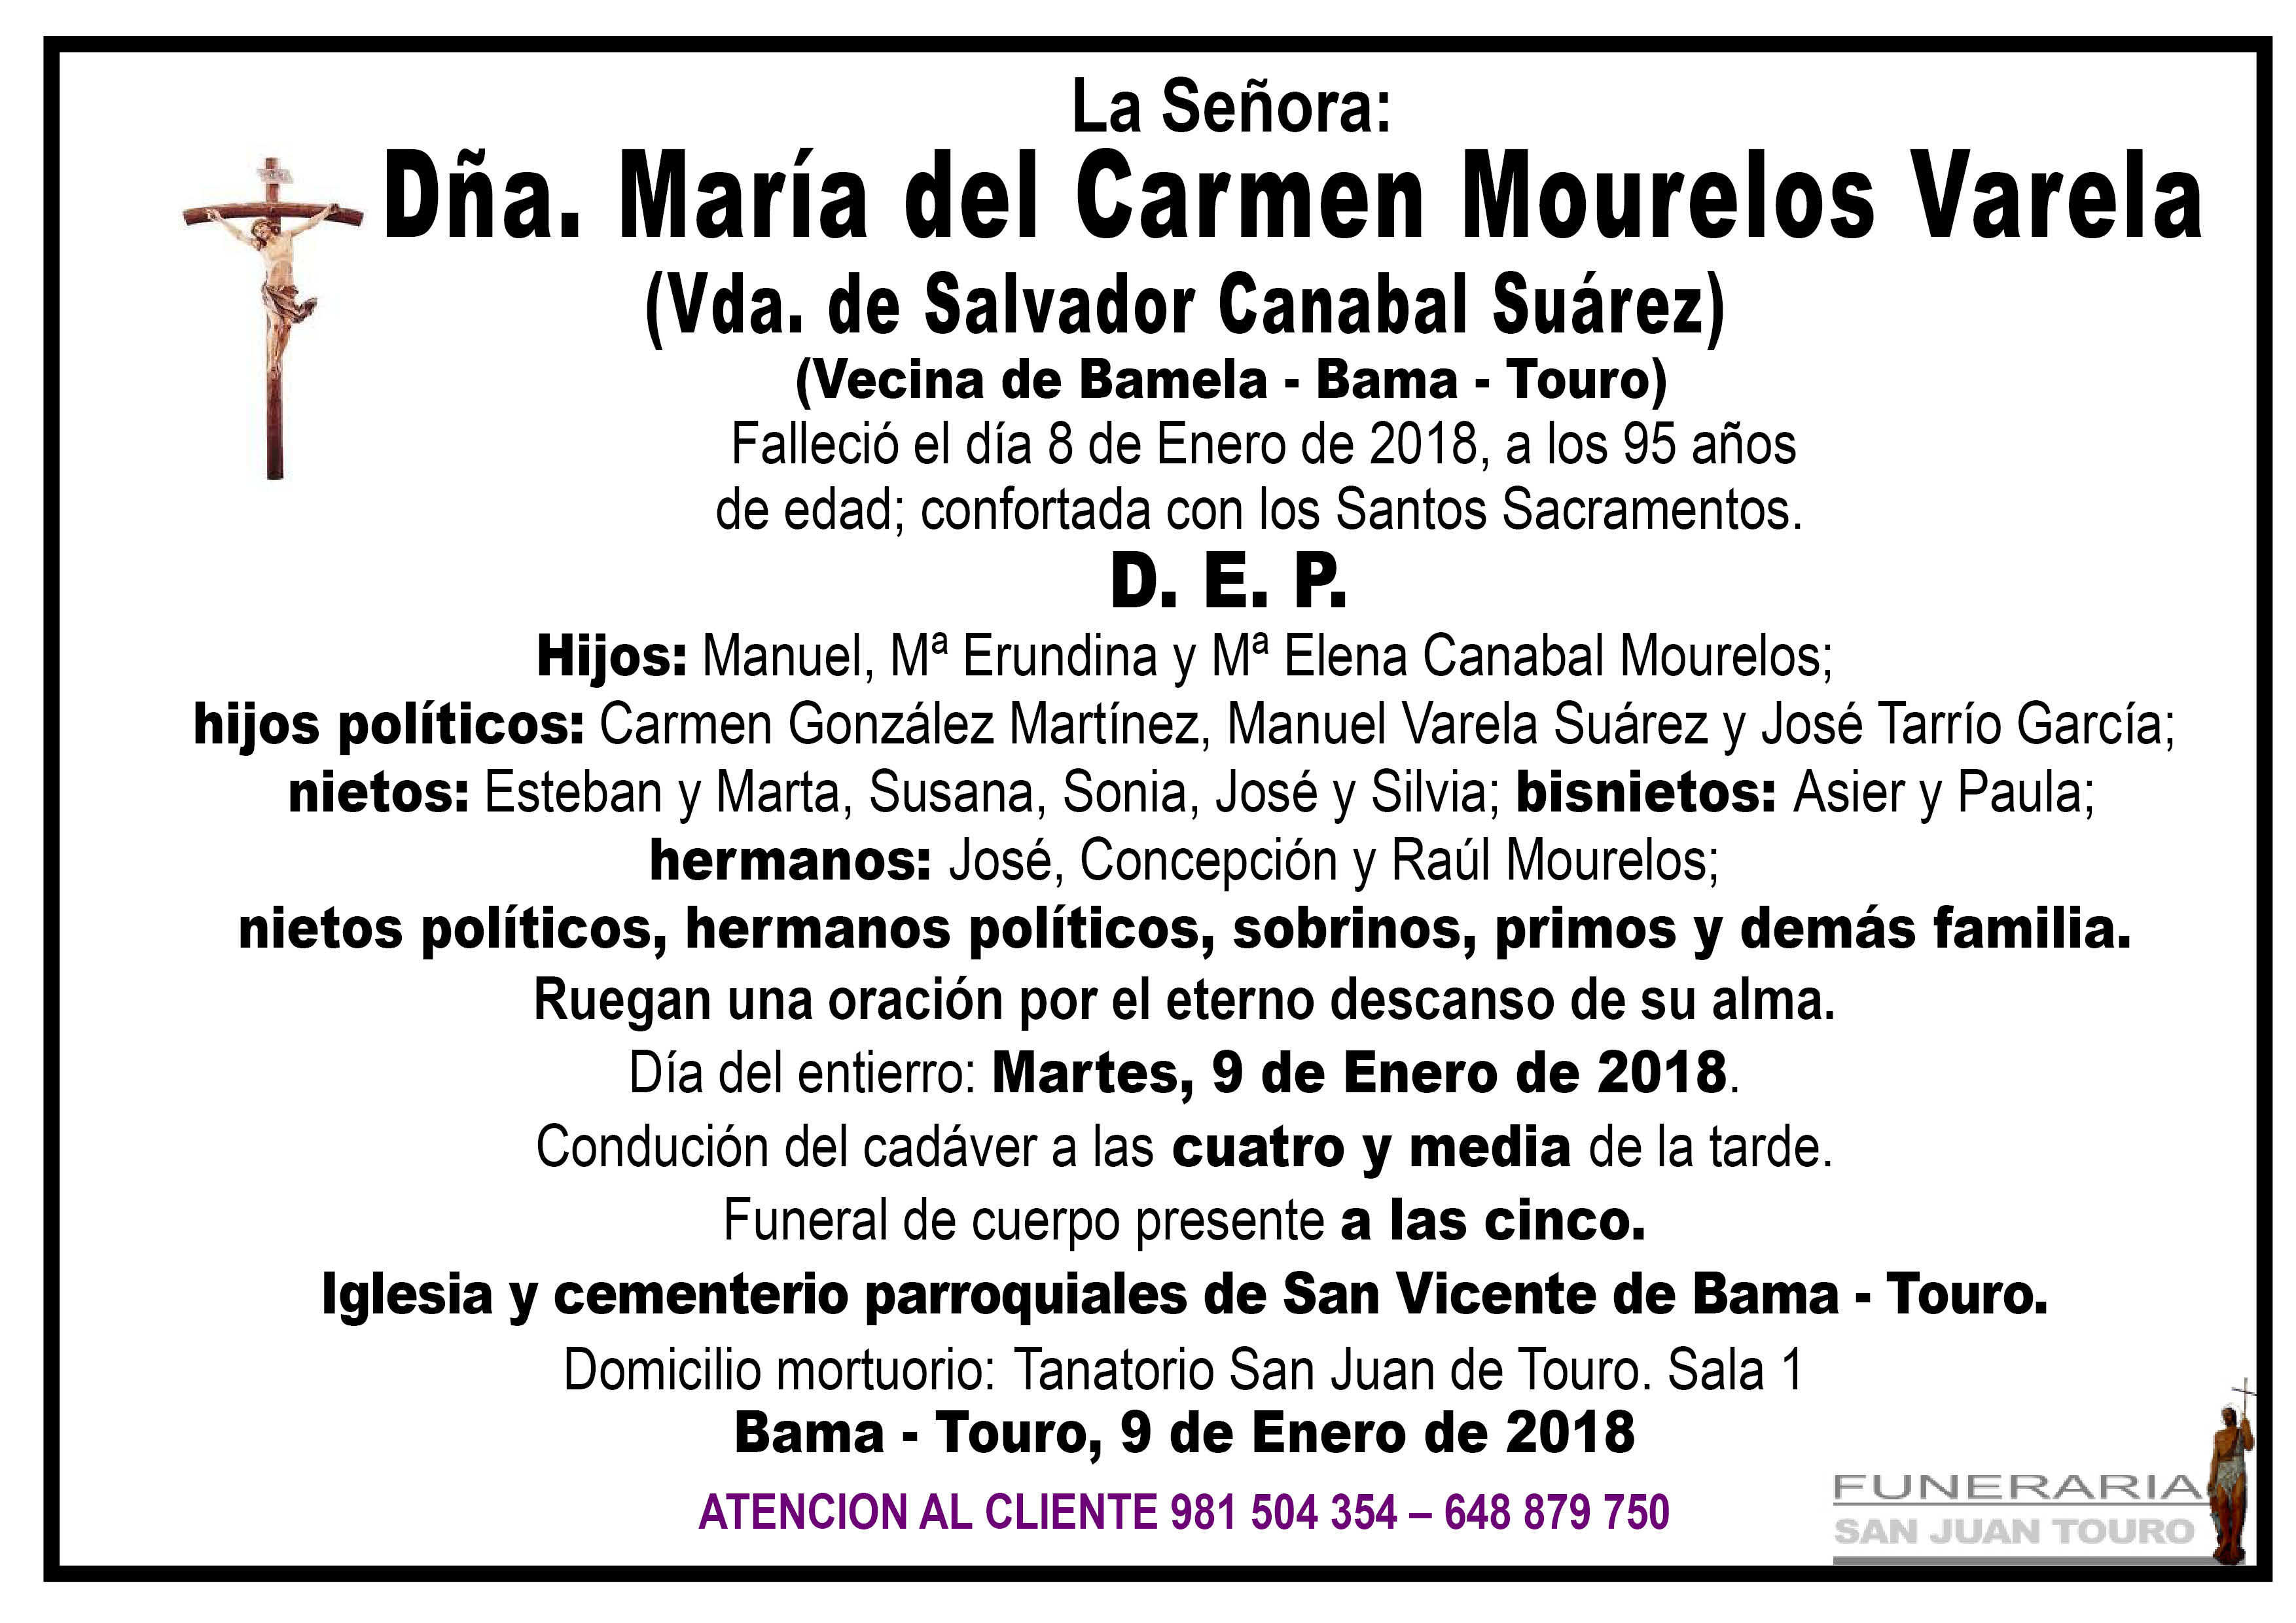 Esquela de SEPELIO DE DÑA. Mª DEL CARMEN MOURELOS VARELA